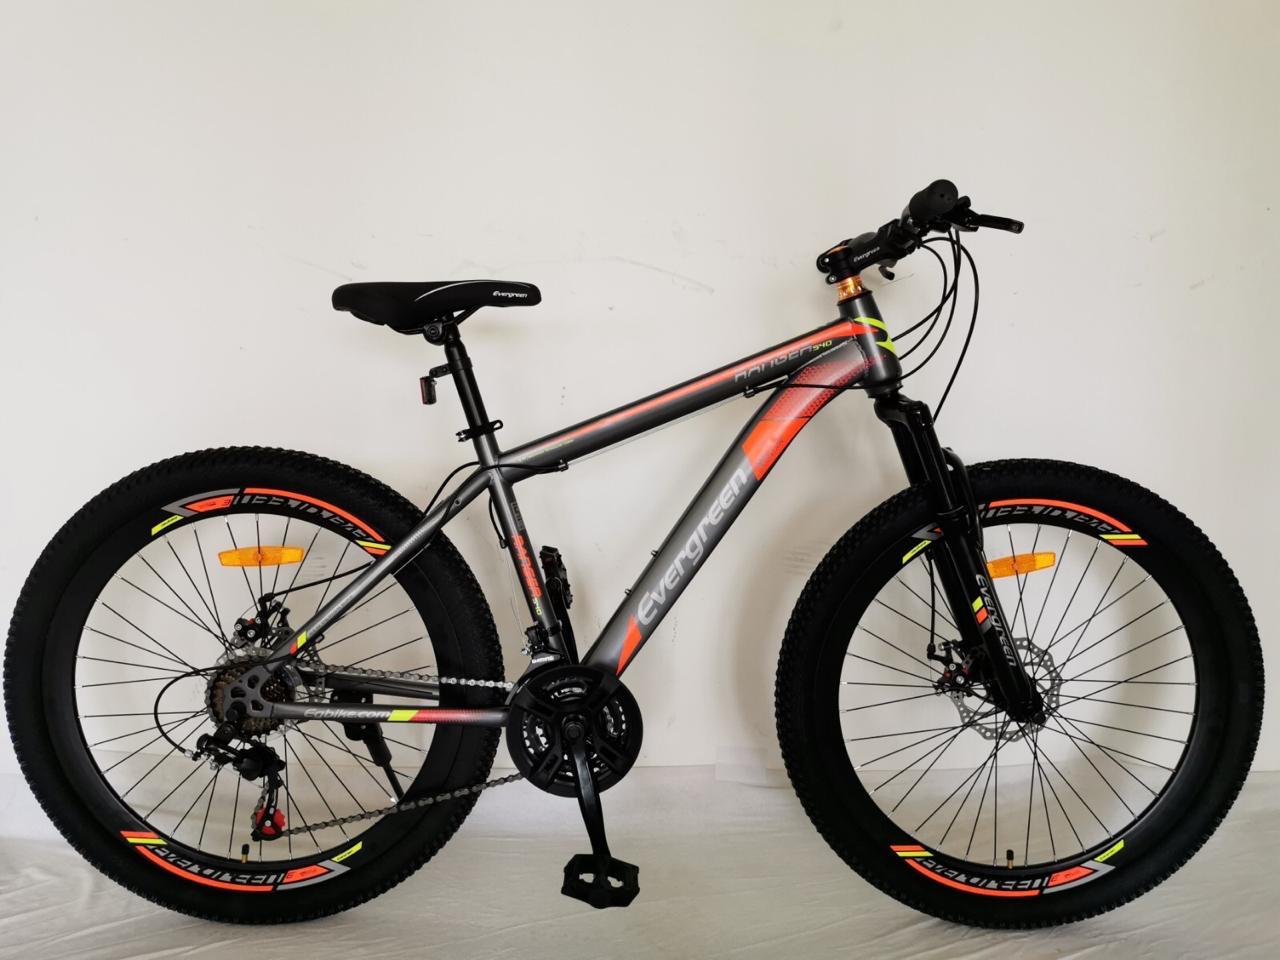 Jual Peralatan Olahraga Sepeda | Lazada.co.id